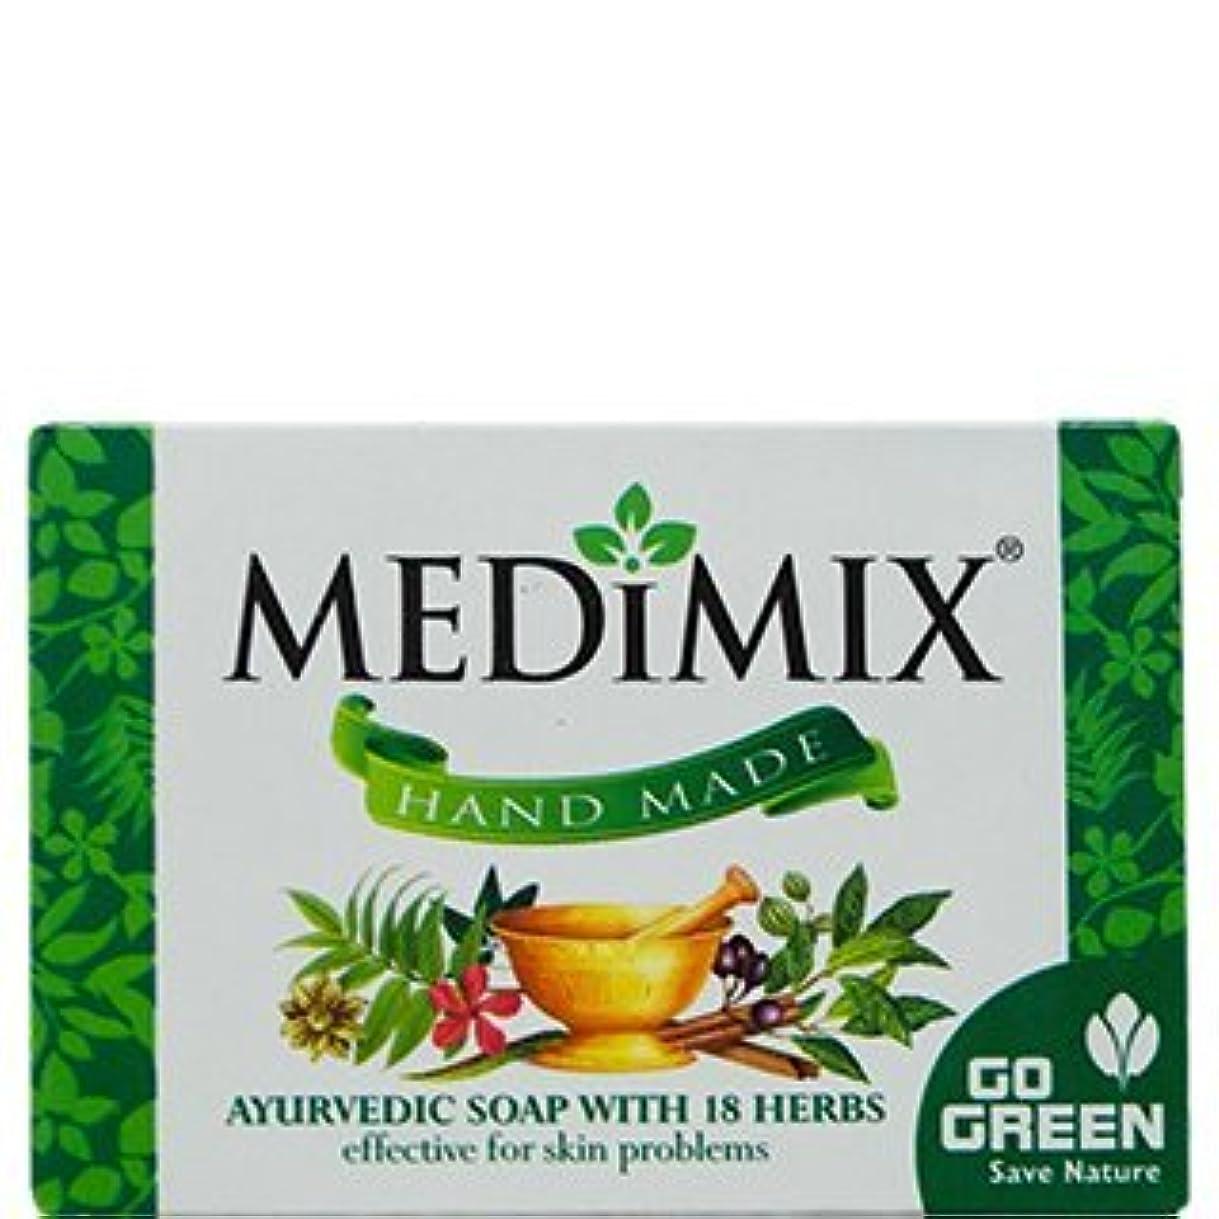 MEDIMIX アーユルヴェーダ メディミックス 石鹸 75g クラッシックグリーン